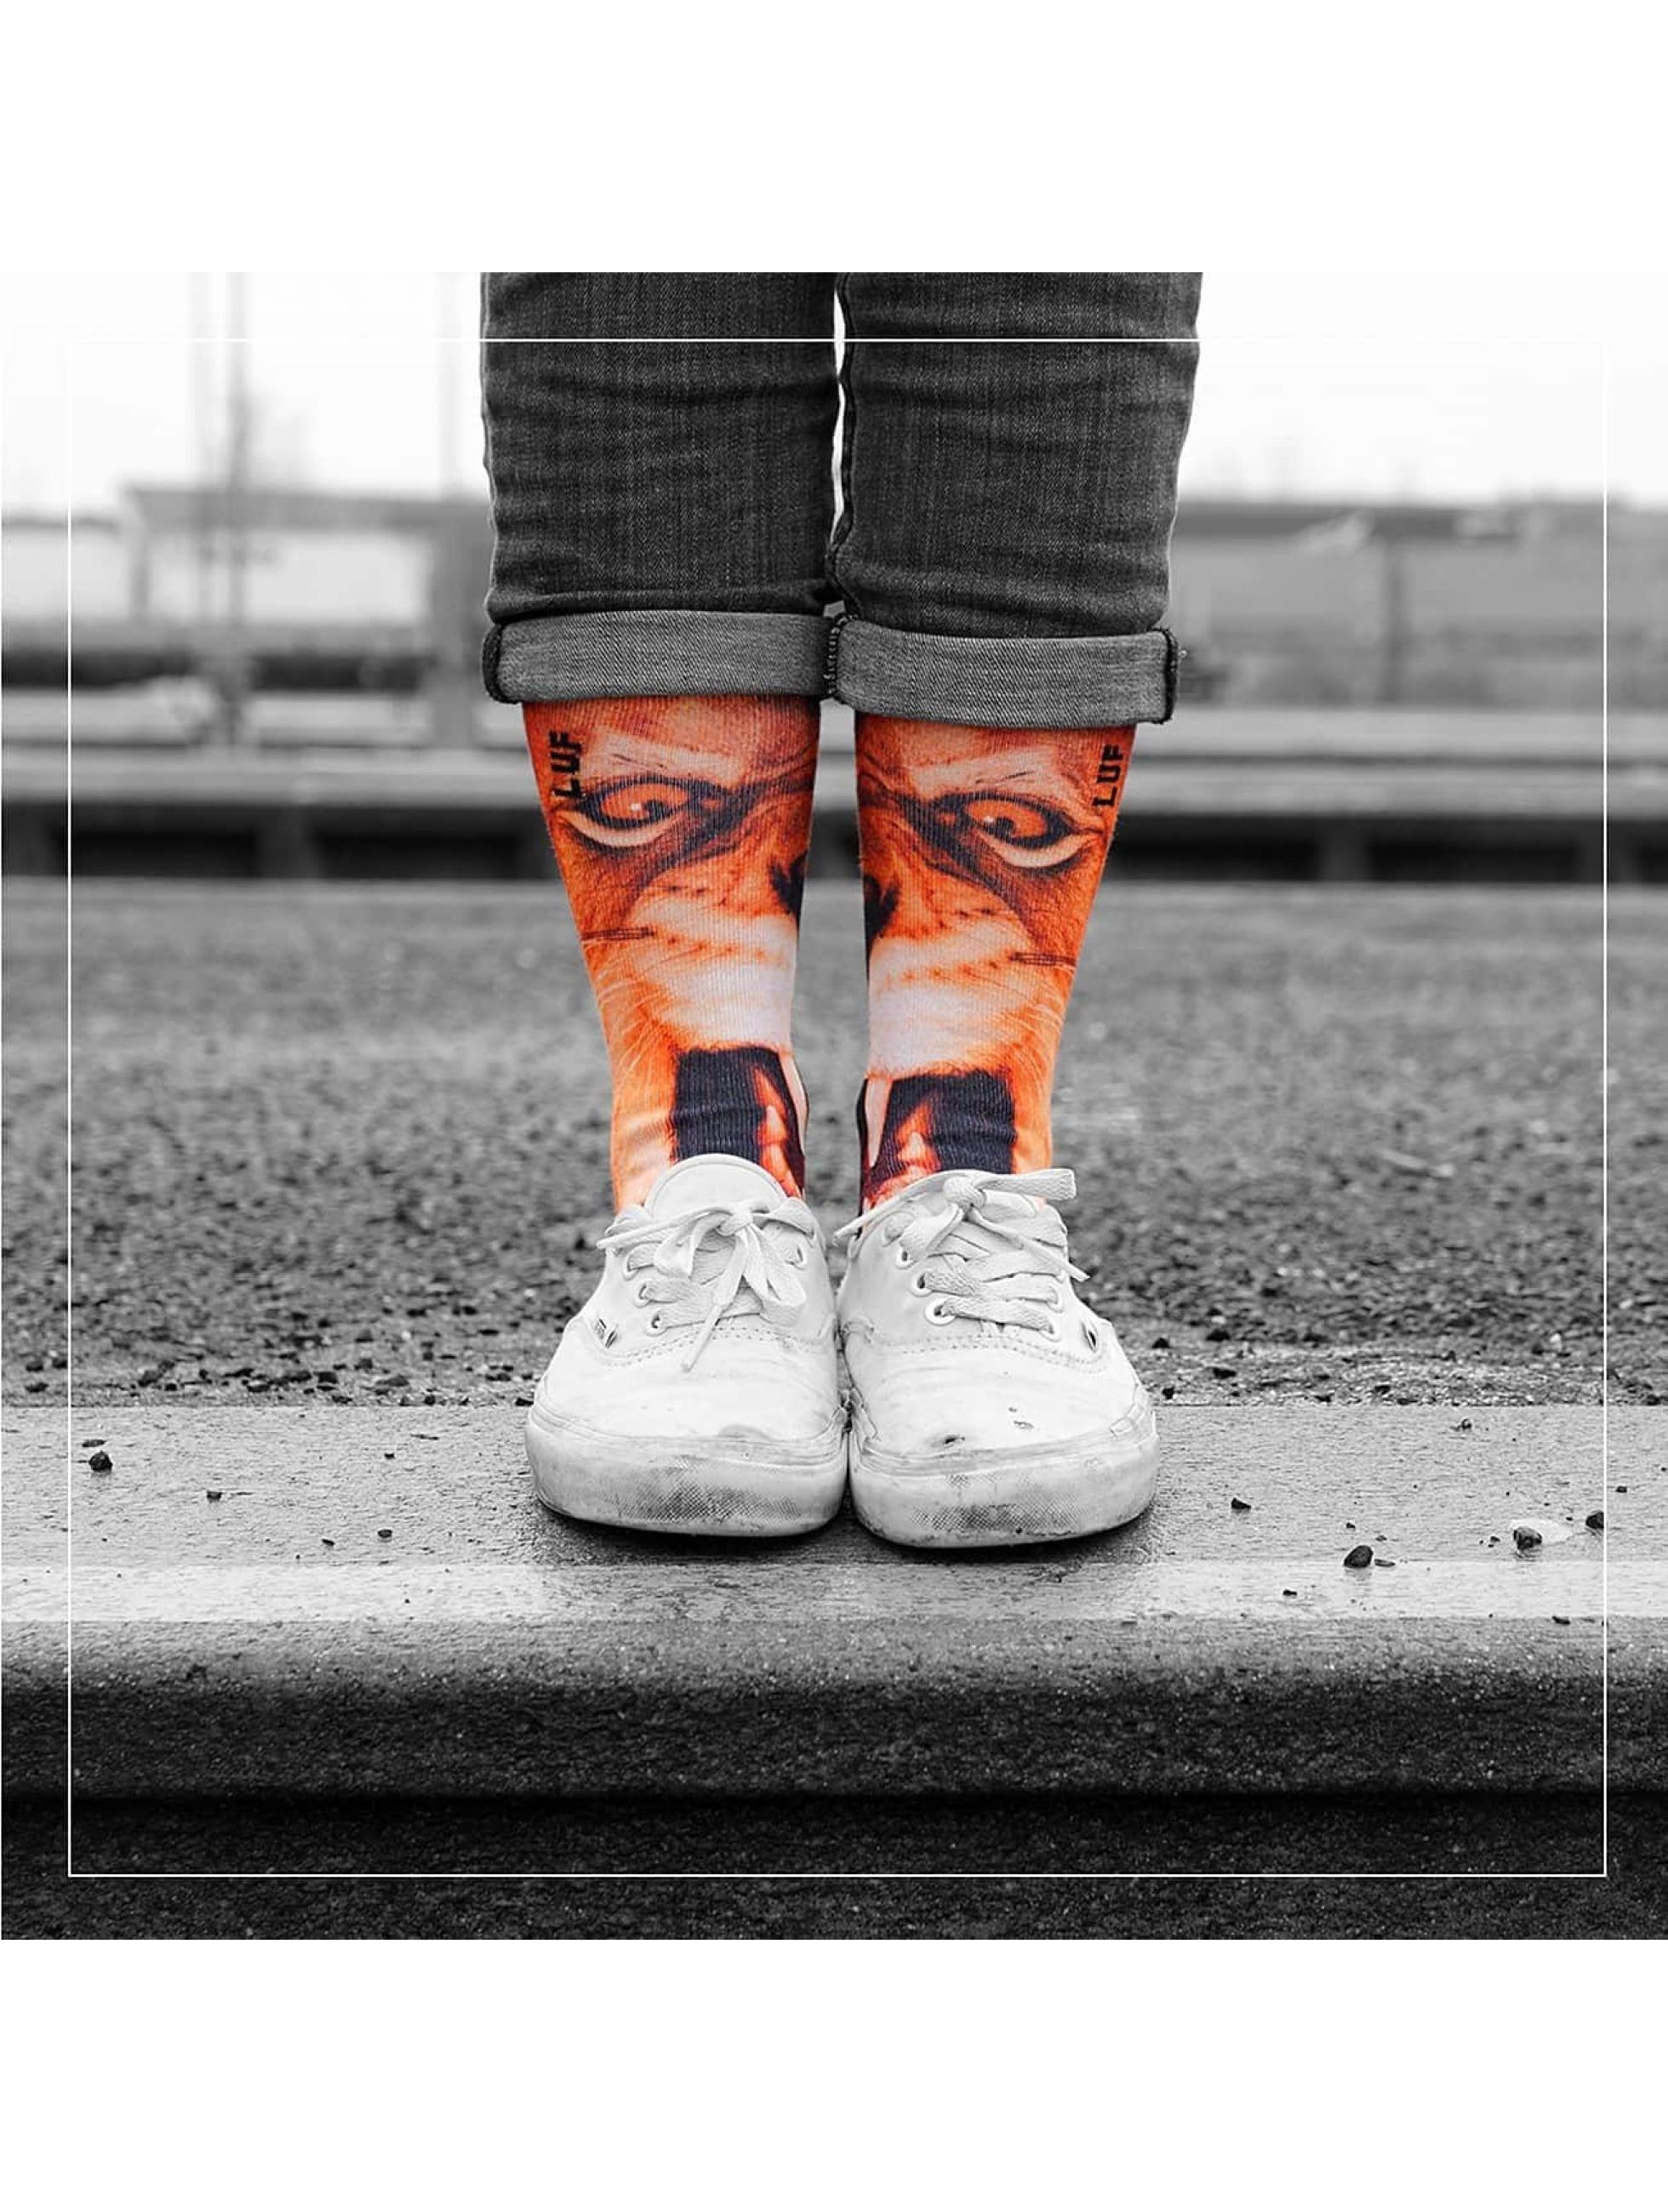 LUF SOX Männer,Frauen Socken Lion in bunt